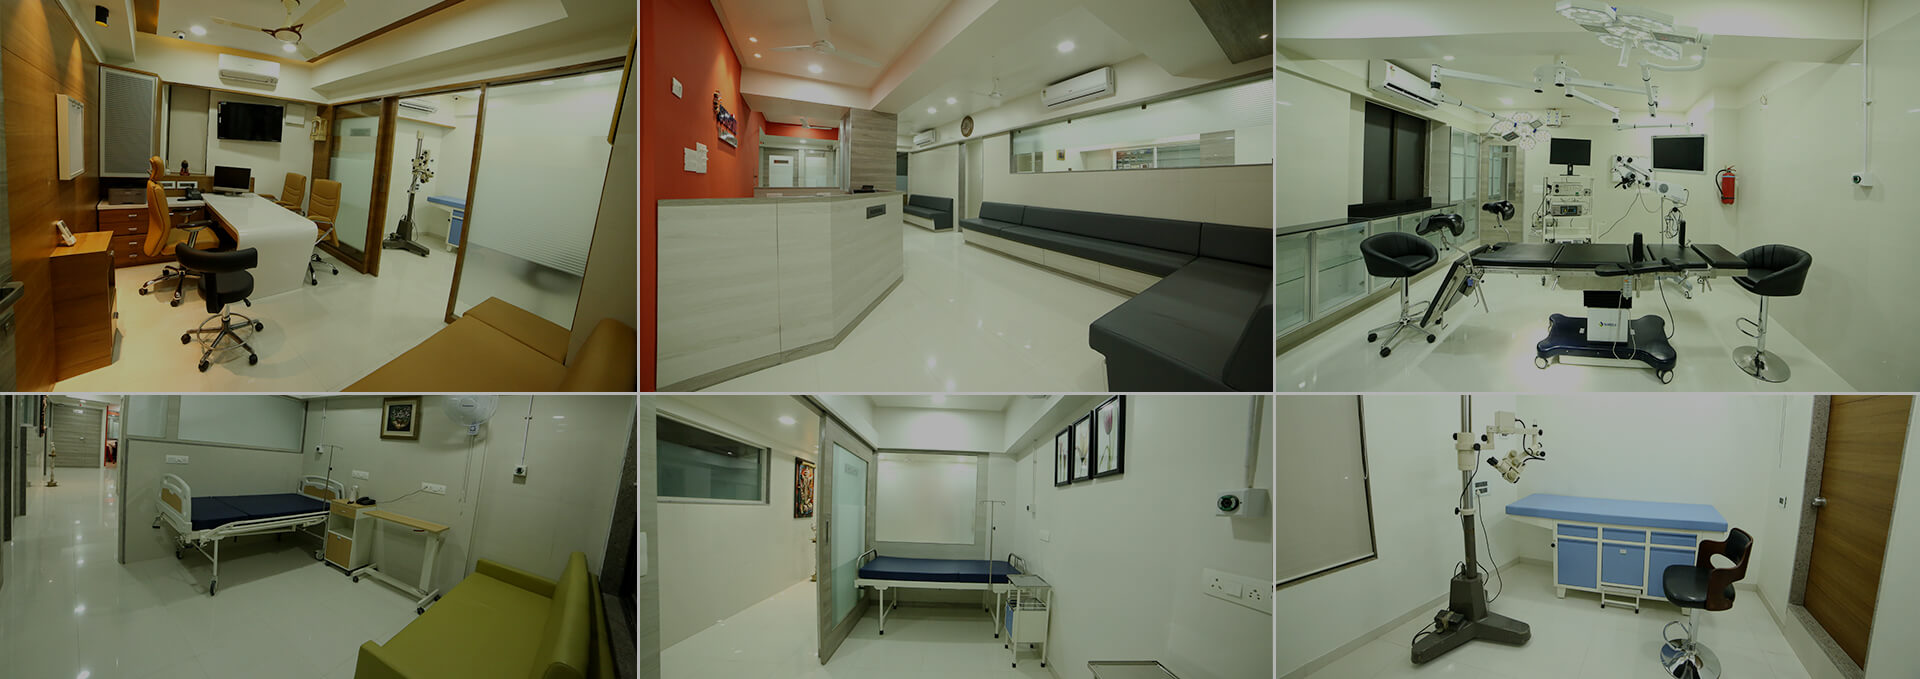 ent surgery hospital